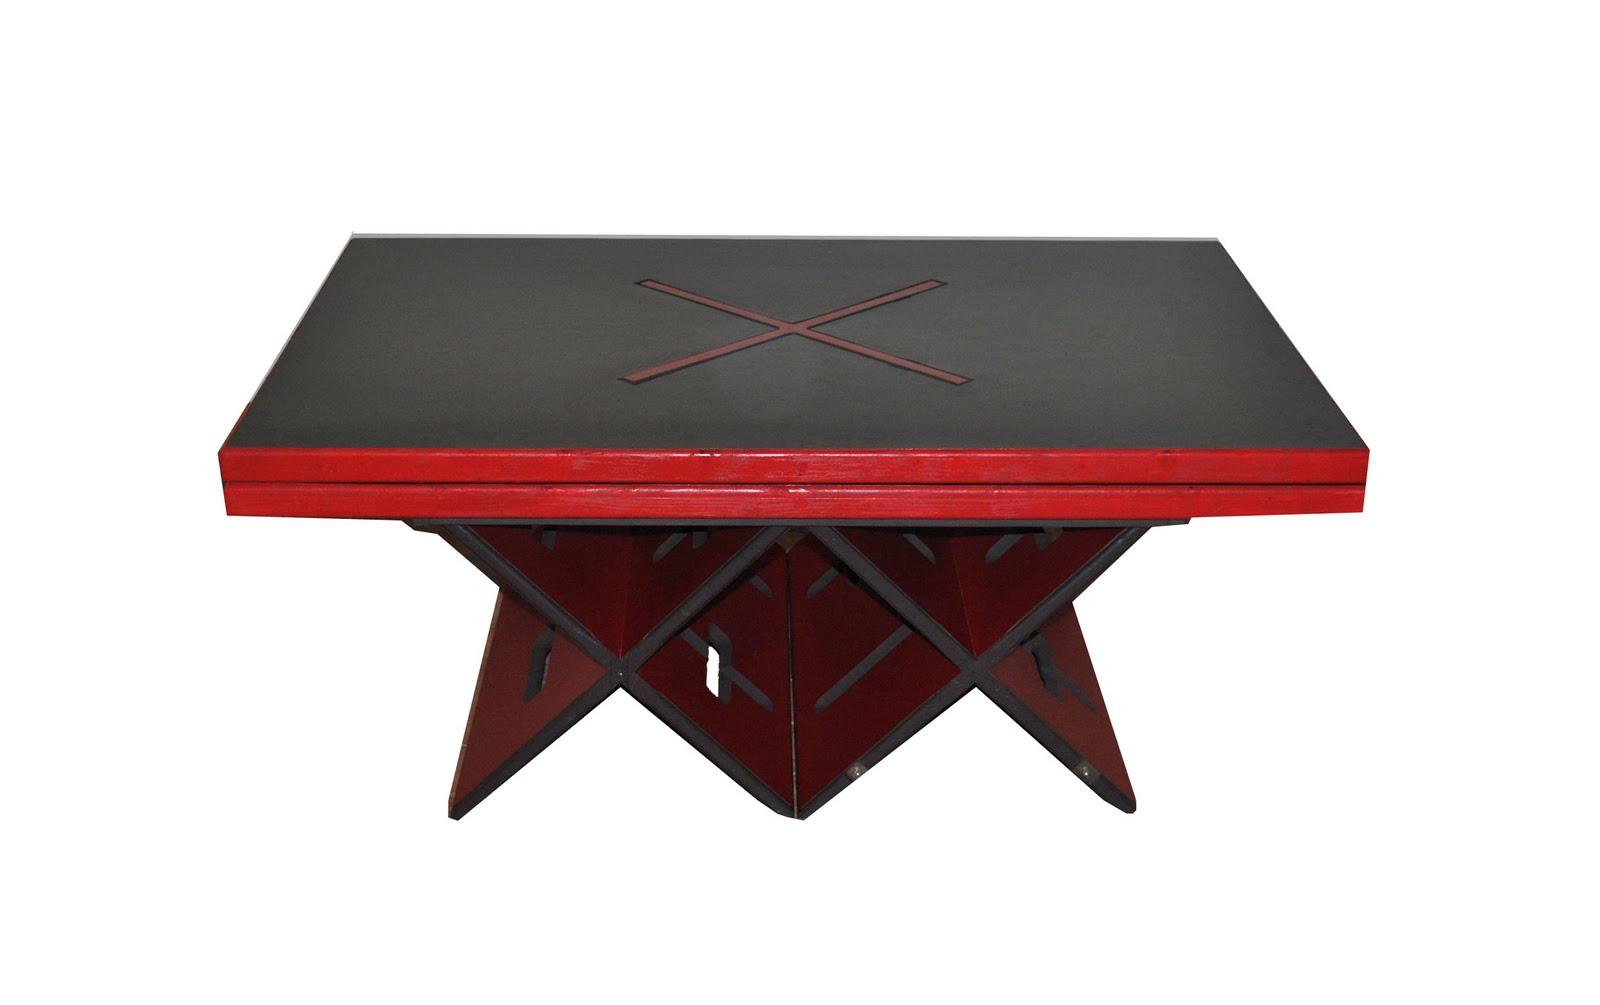 Mlle vintage table ou trema design - Table basse convertible en table a manger ...